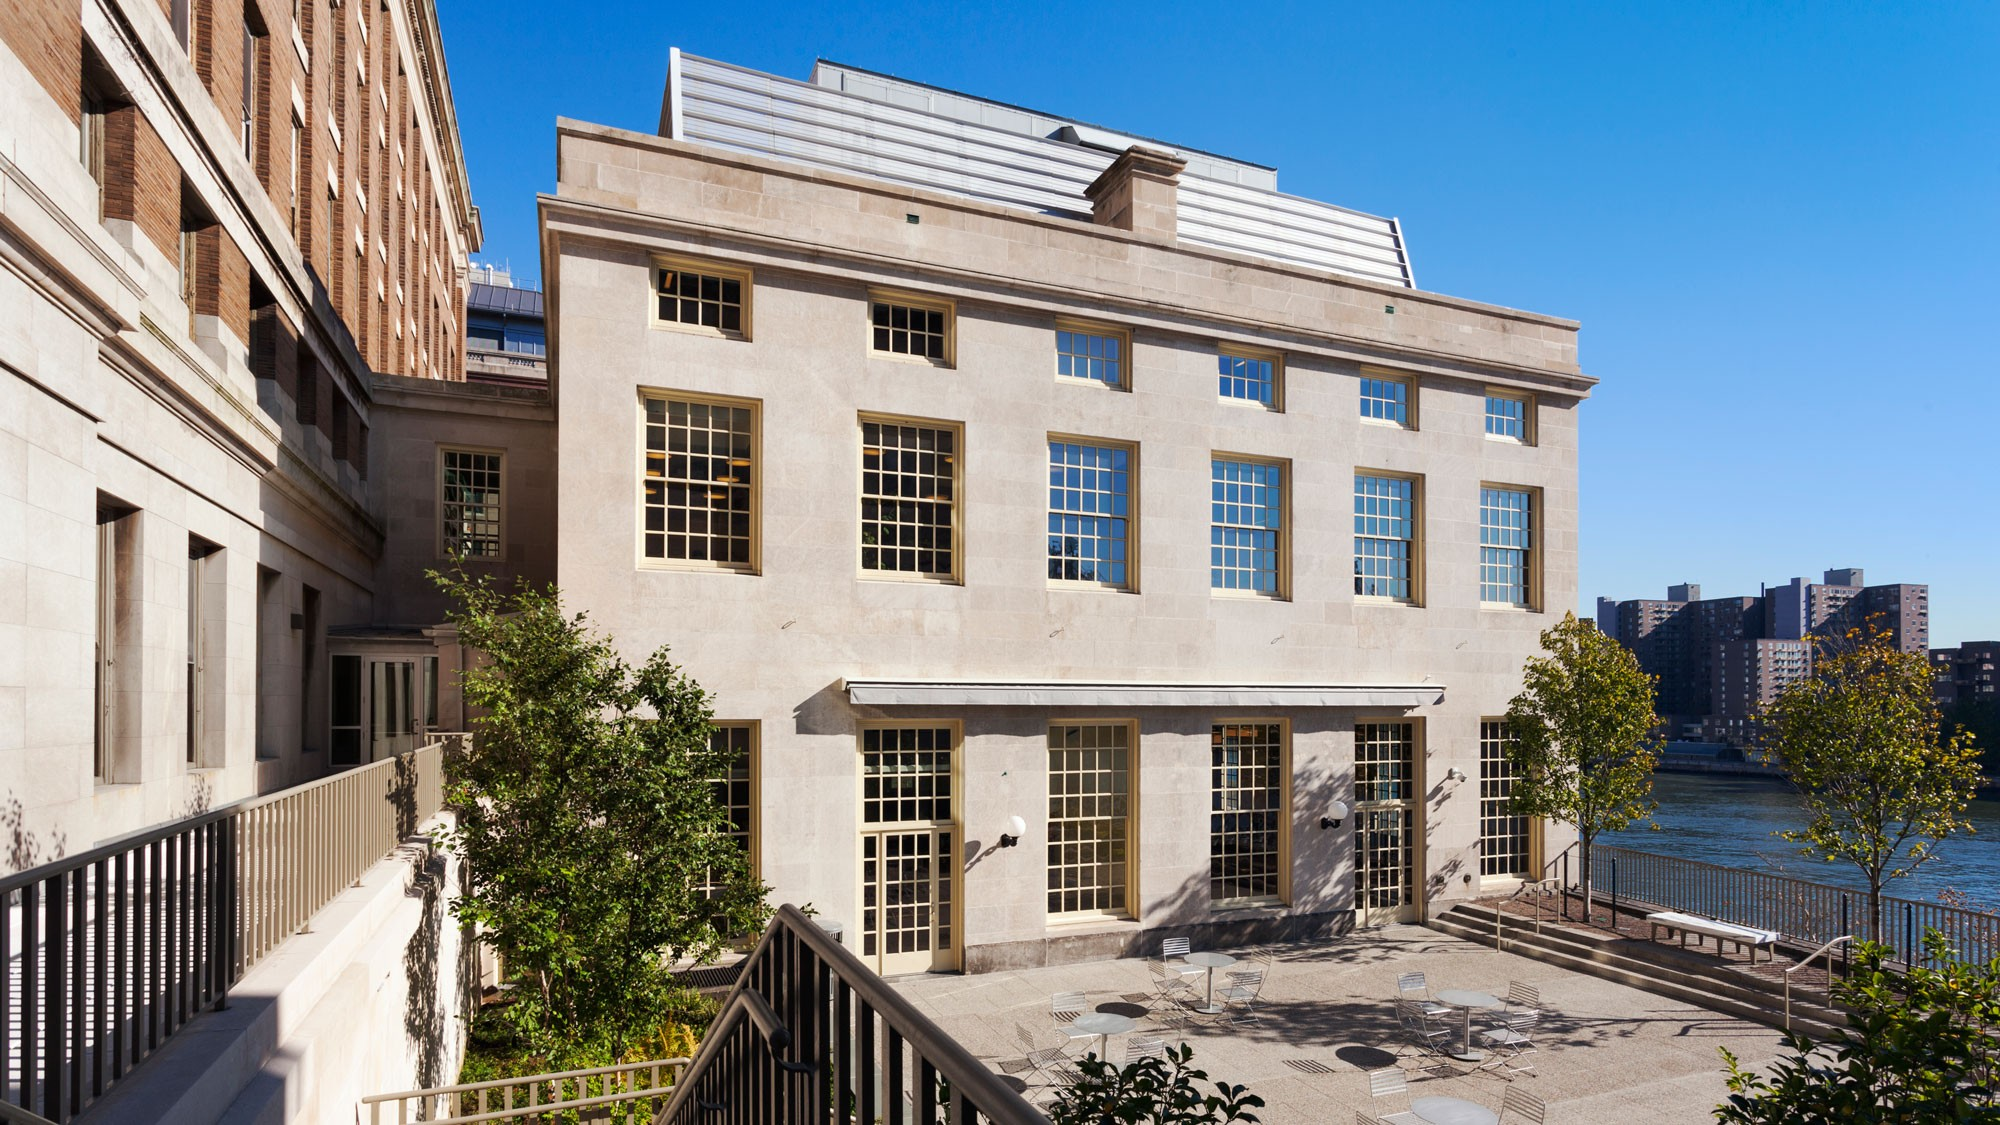 Rockefeller University - Welch Library